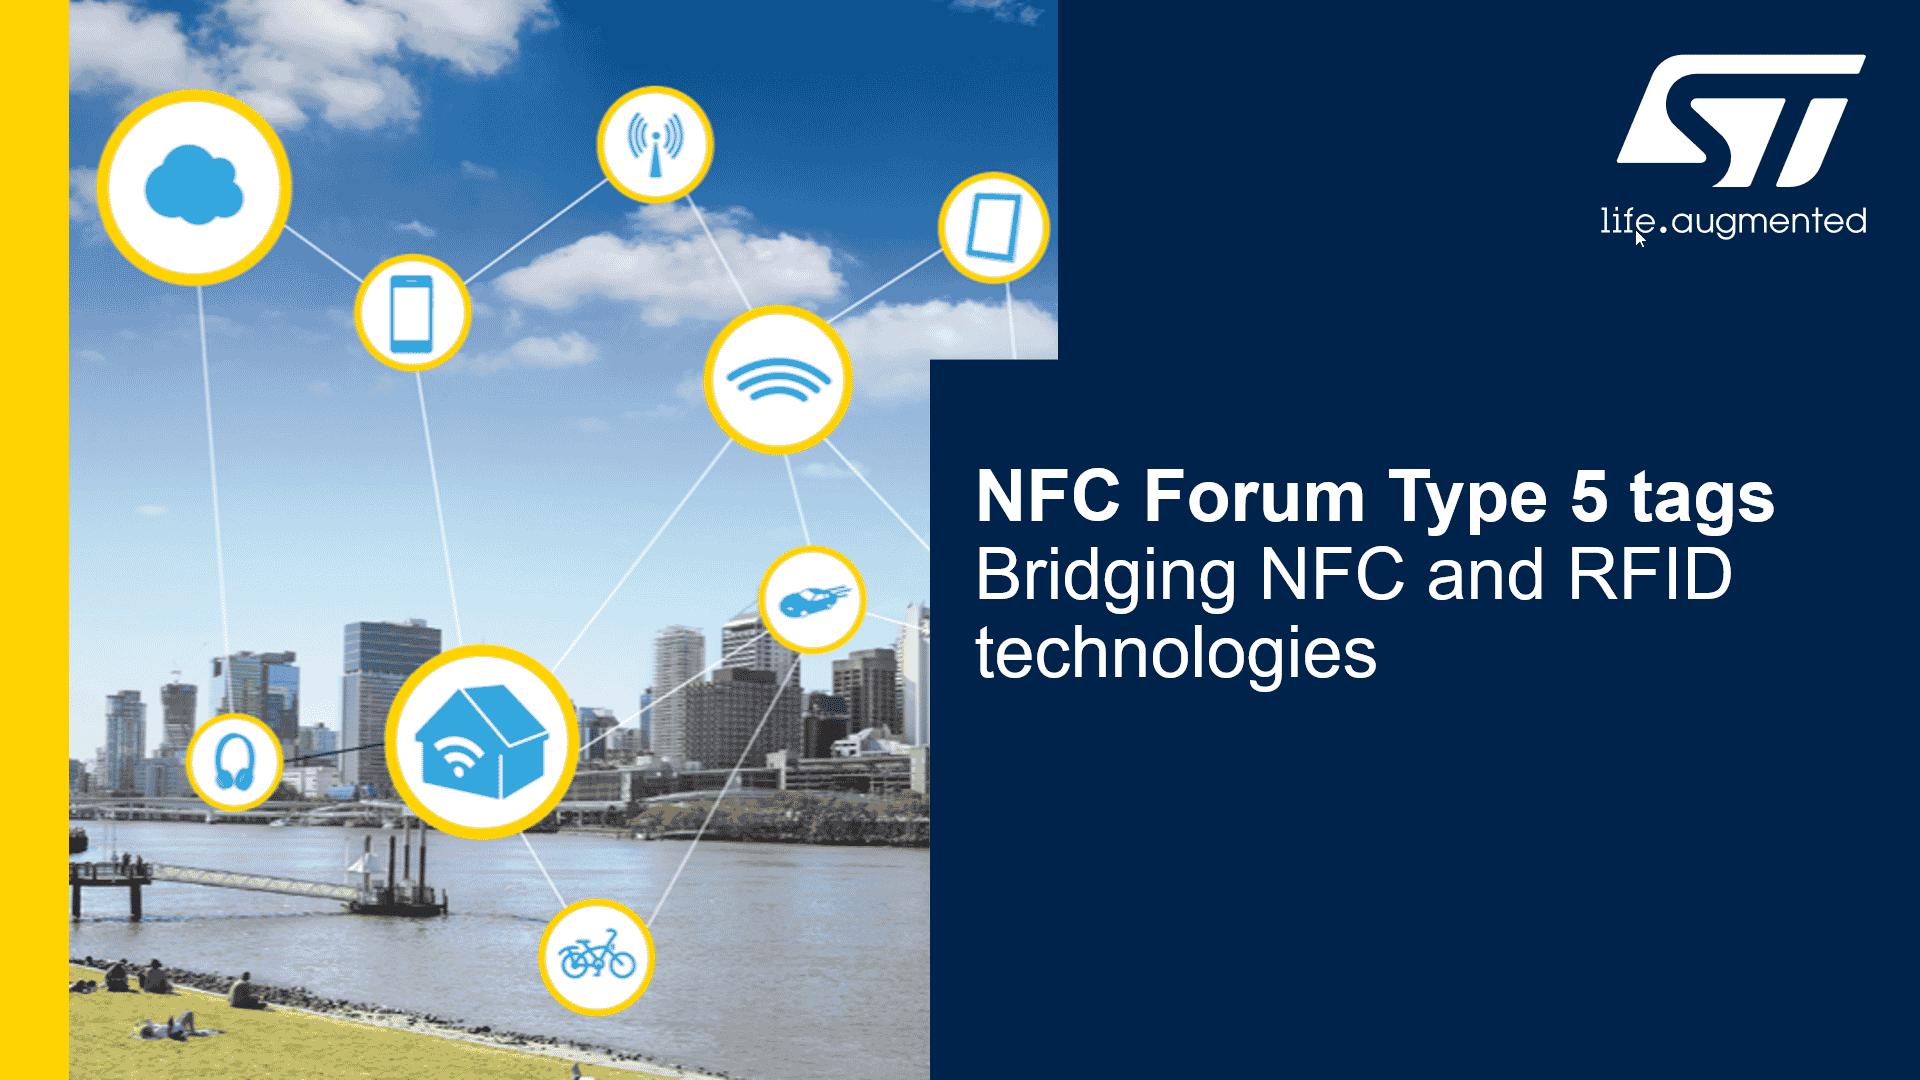 ST NFC Forum Type 5 tags webinar